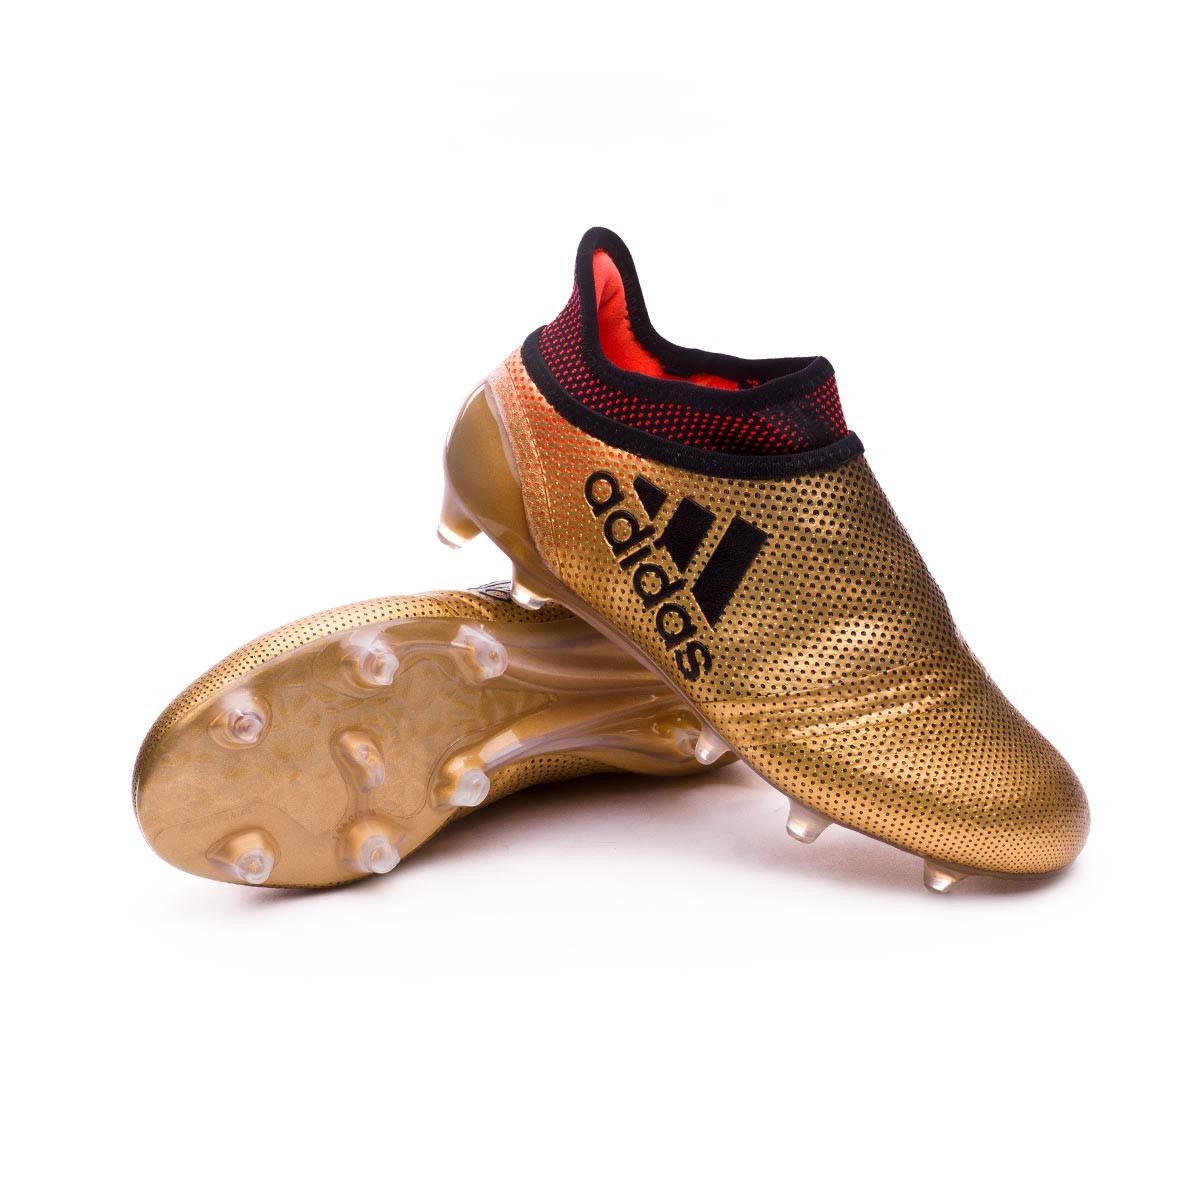 Fg Niño Gold Adidas 17 Fútbol De Purespeed Zapatos Tactile X fzBqH0Ynxw